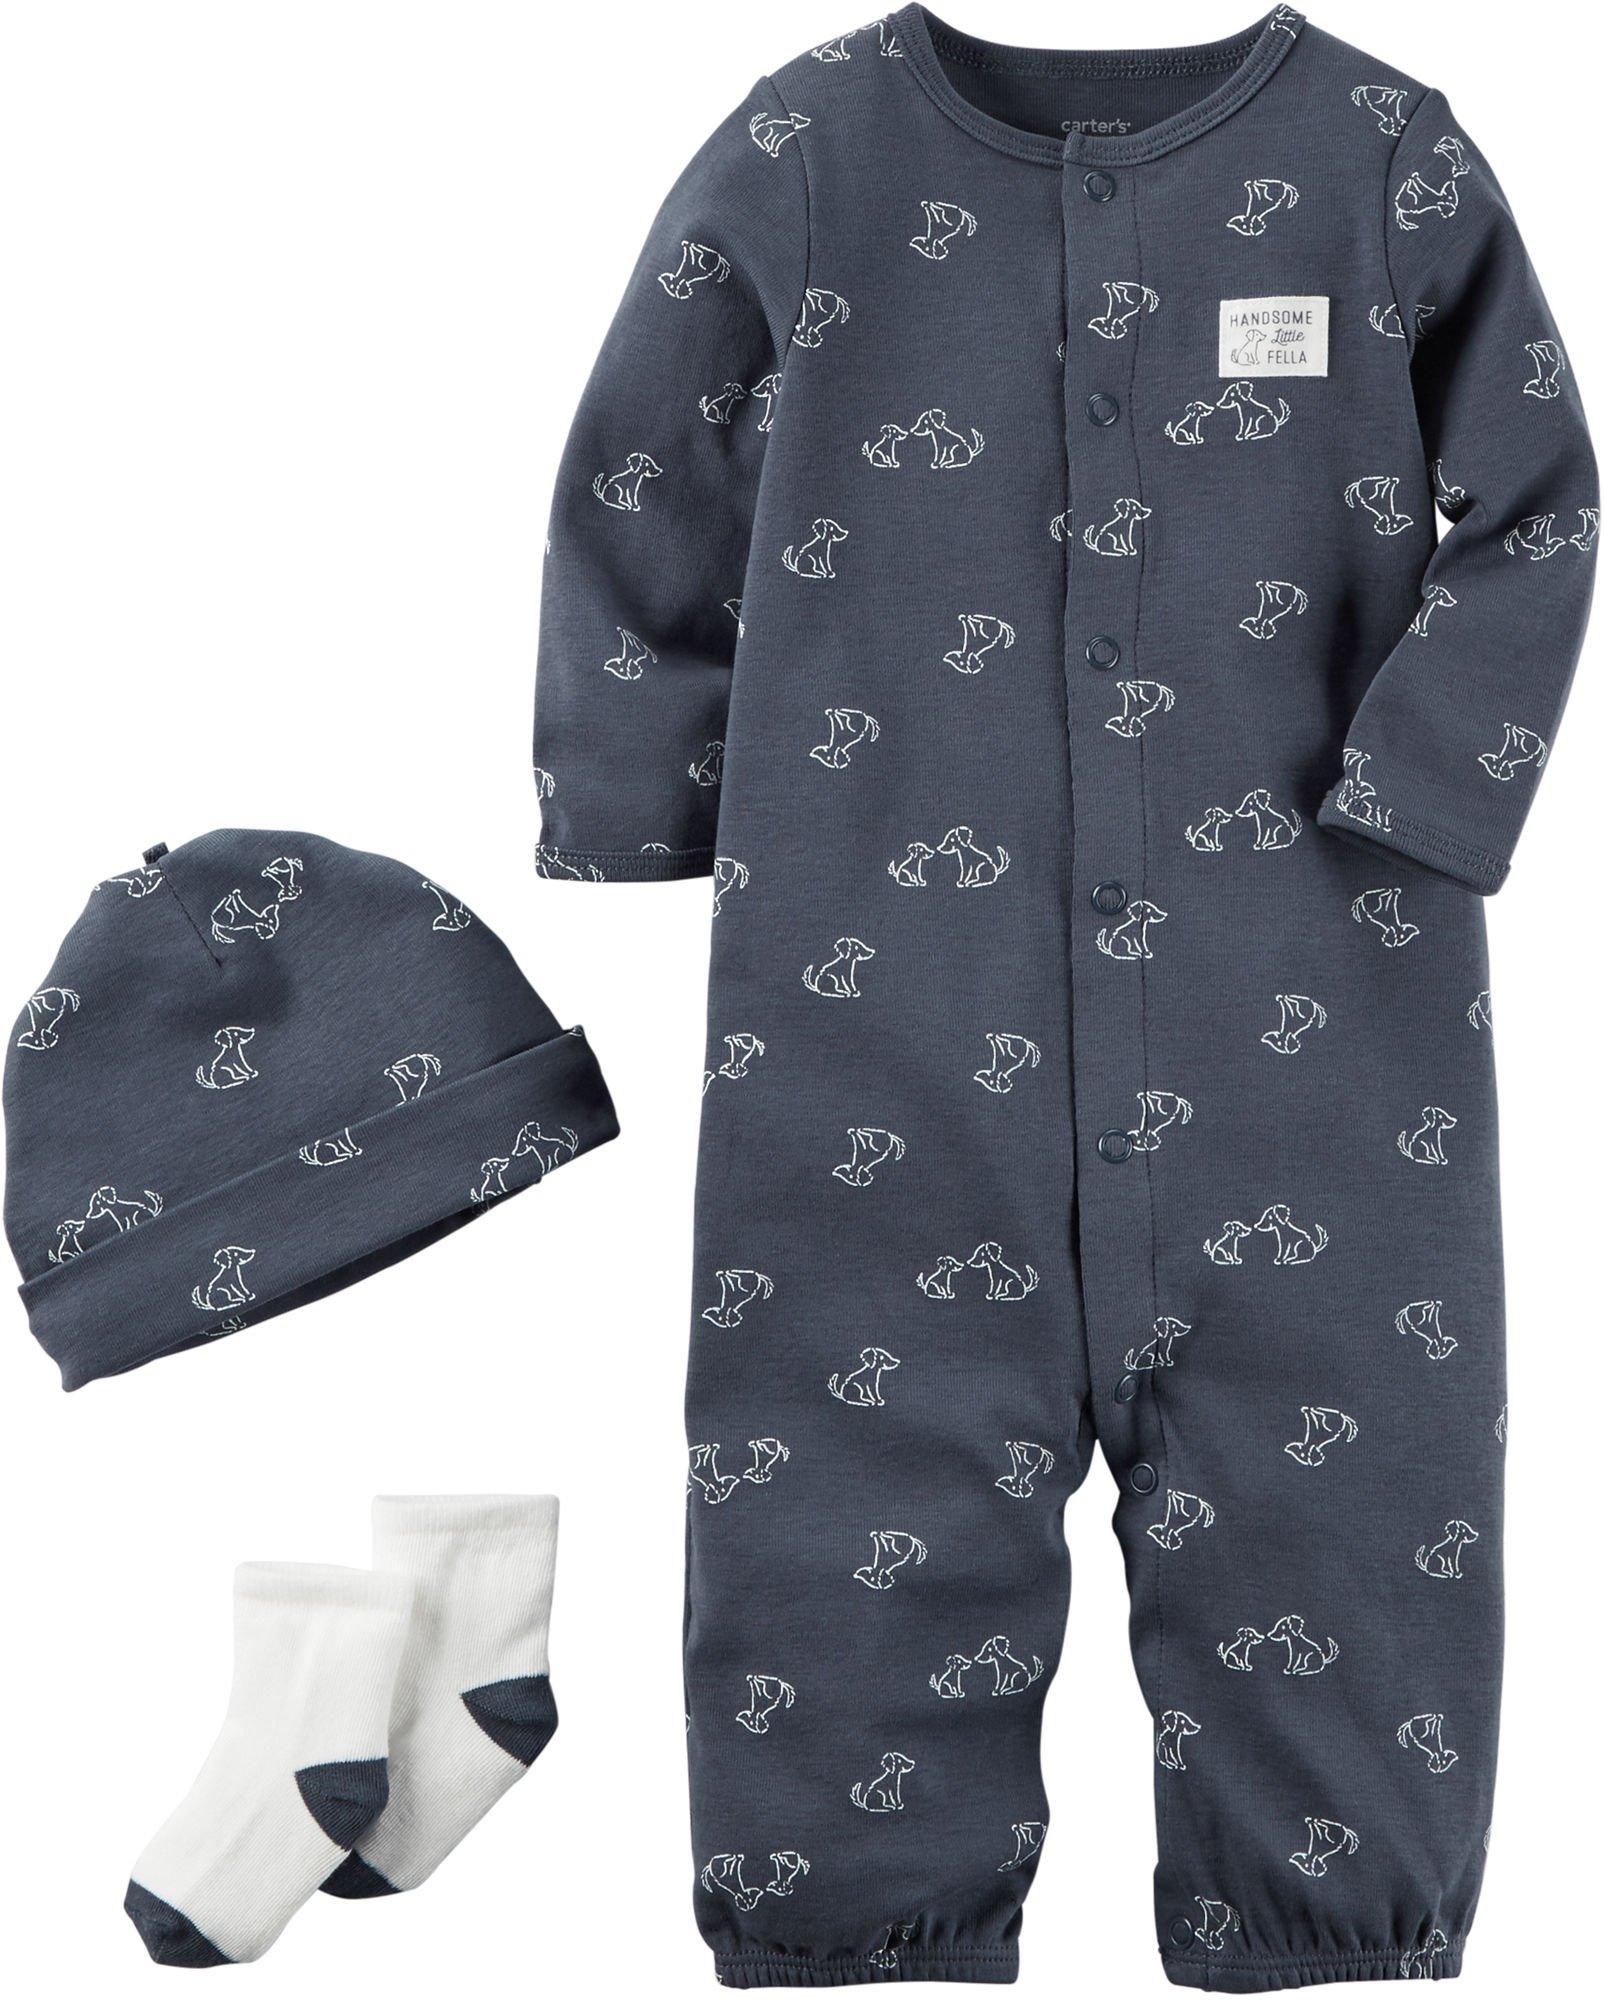 Carter's Baby Boys' 3 Piece Bodysuit Set 6 Months